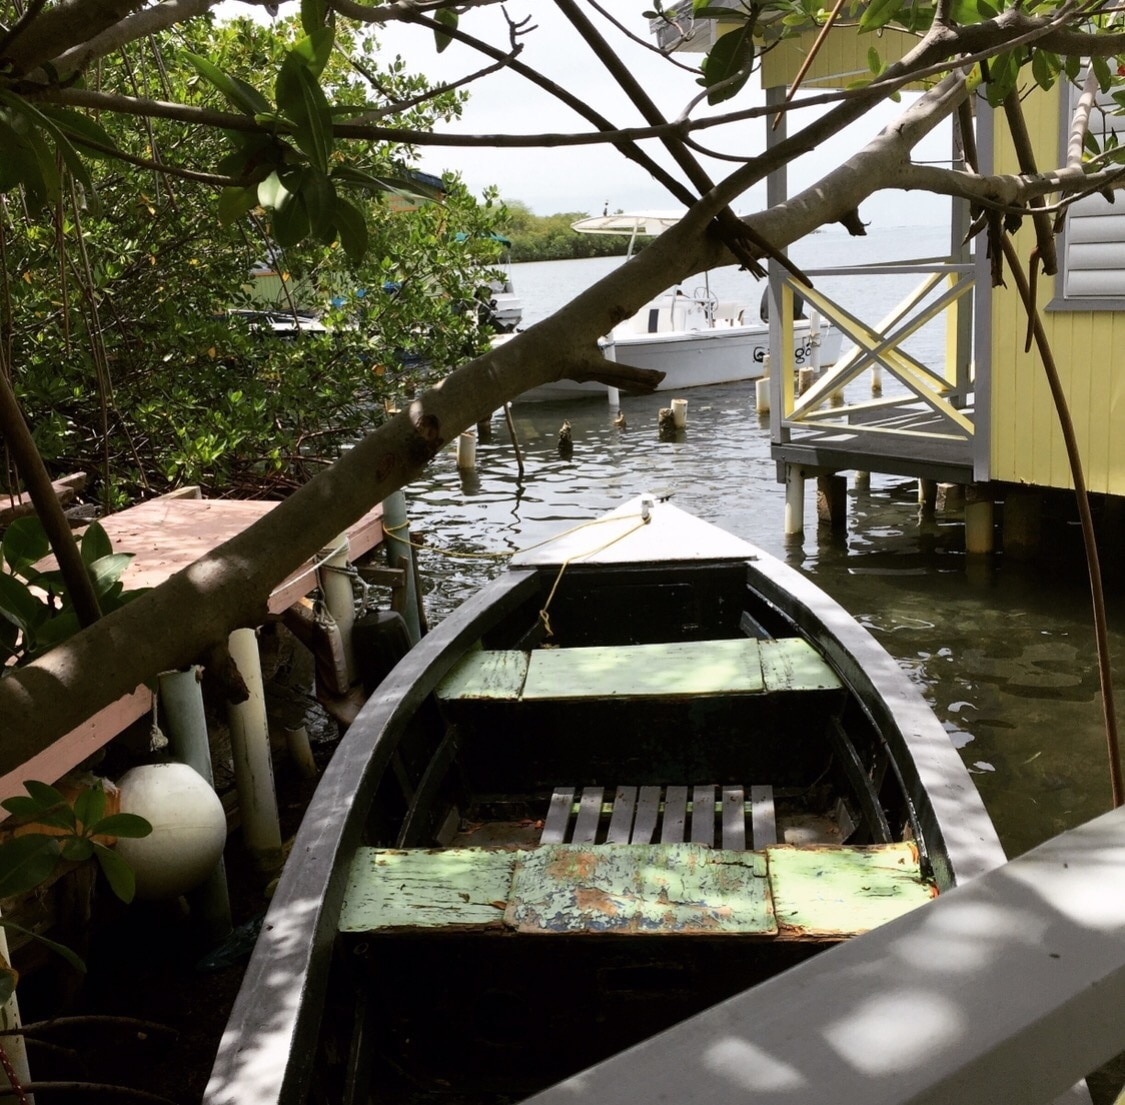 La Parguera, Lajas, Puerto Rico